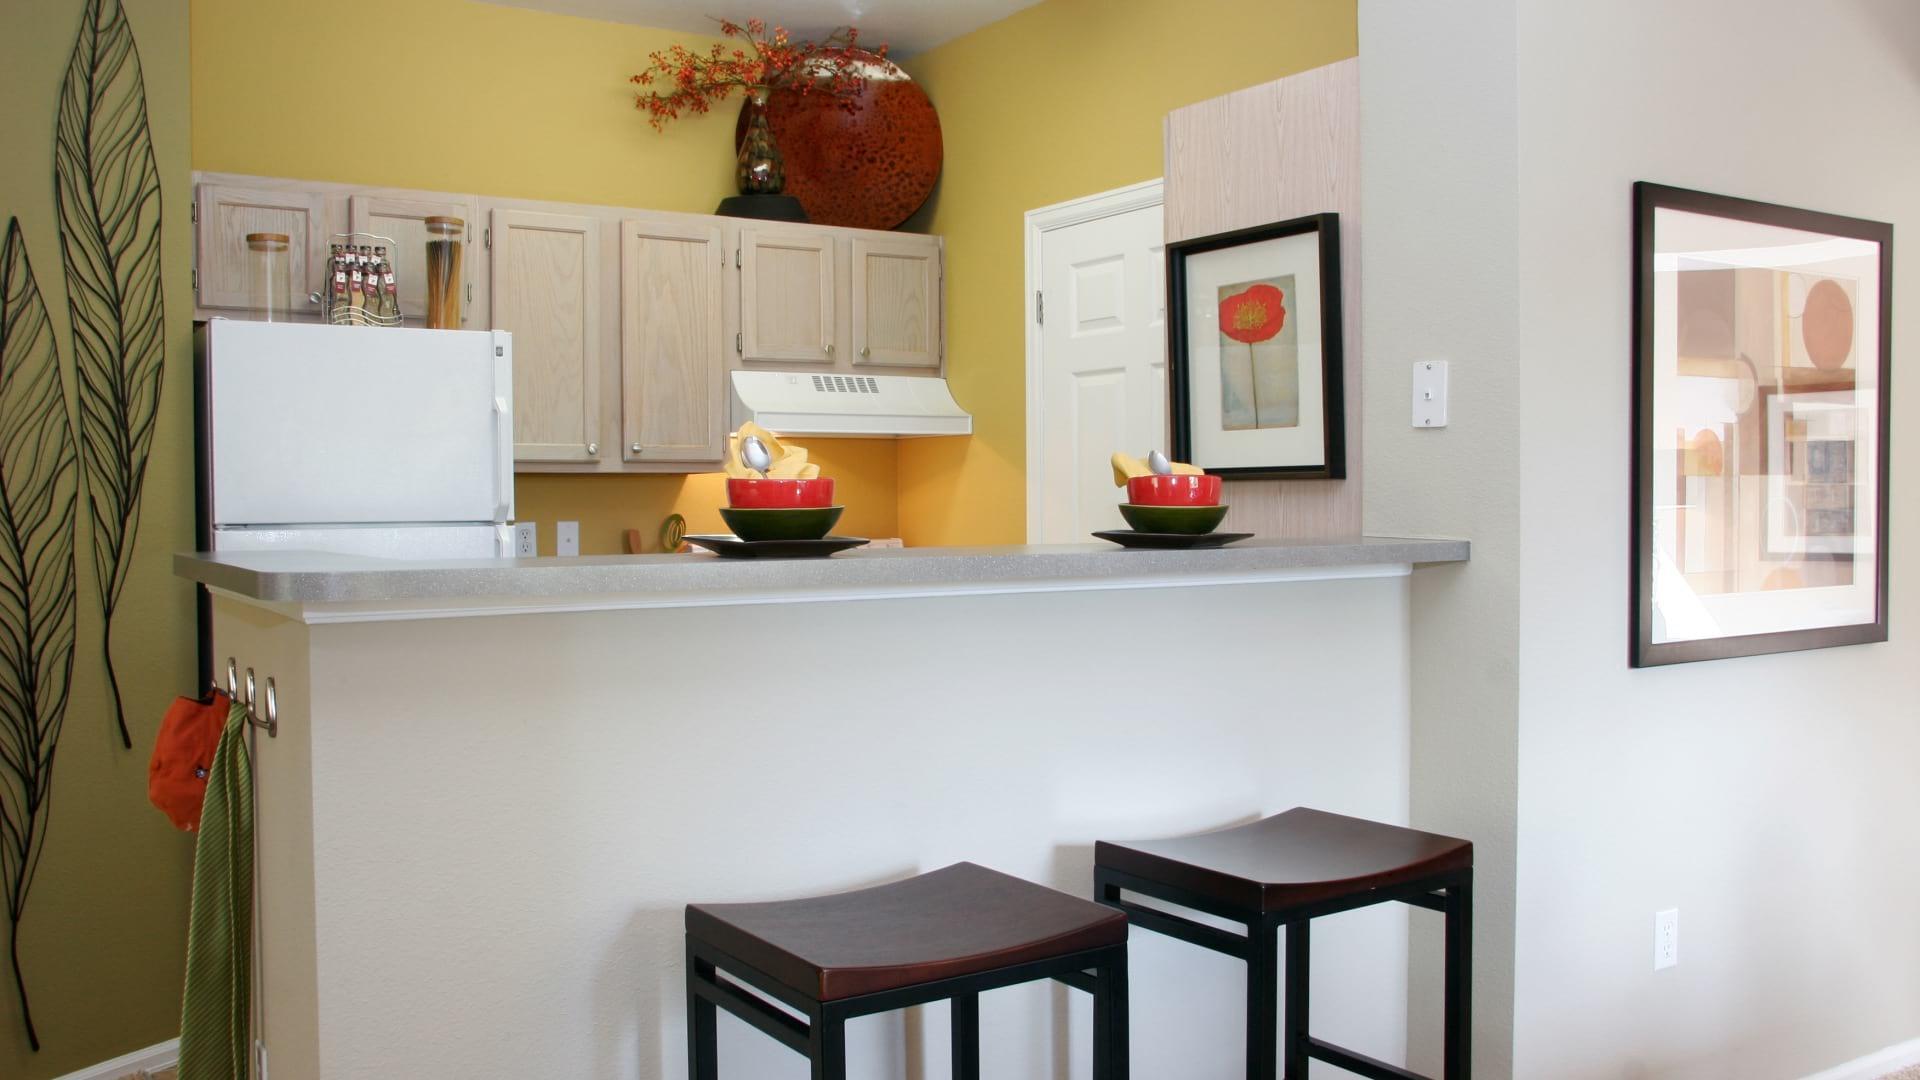 Welcome to Cortland Covington Ridge Apartments